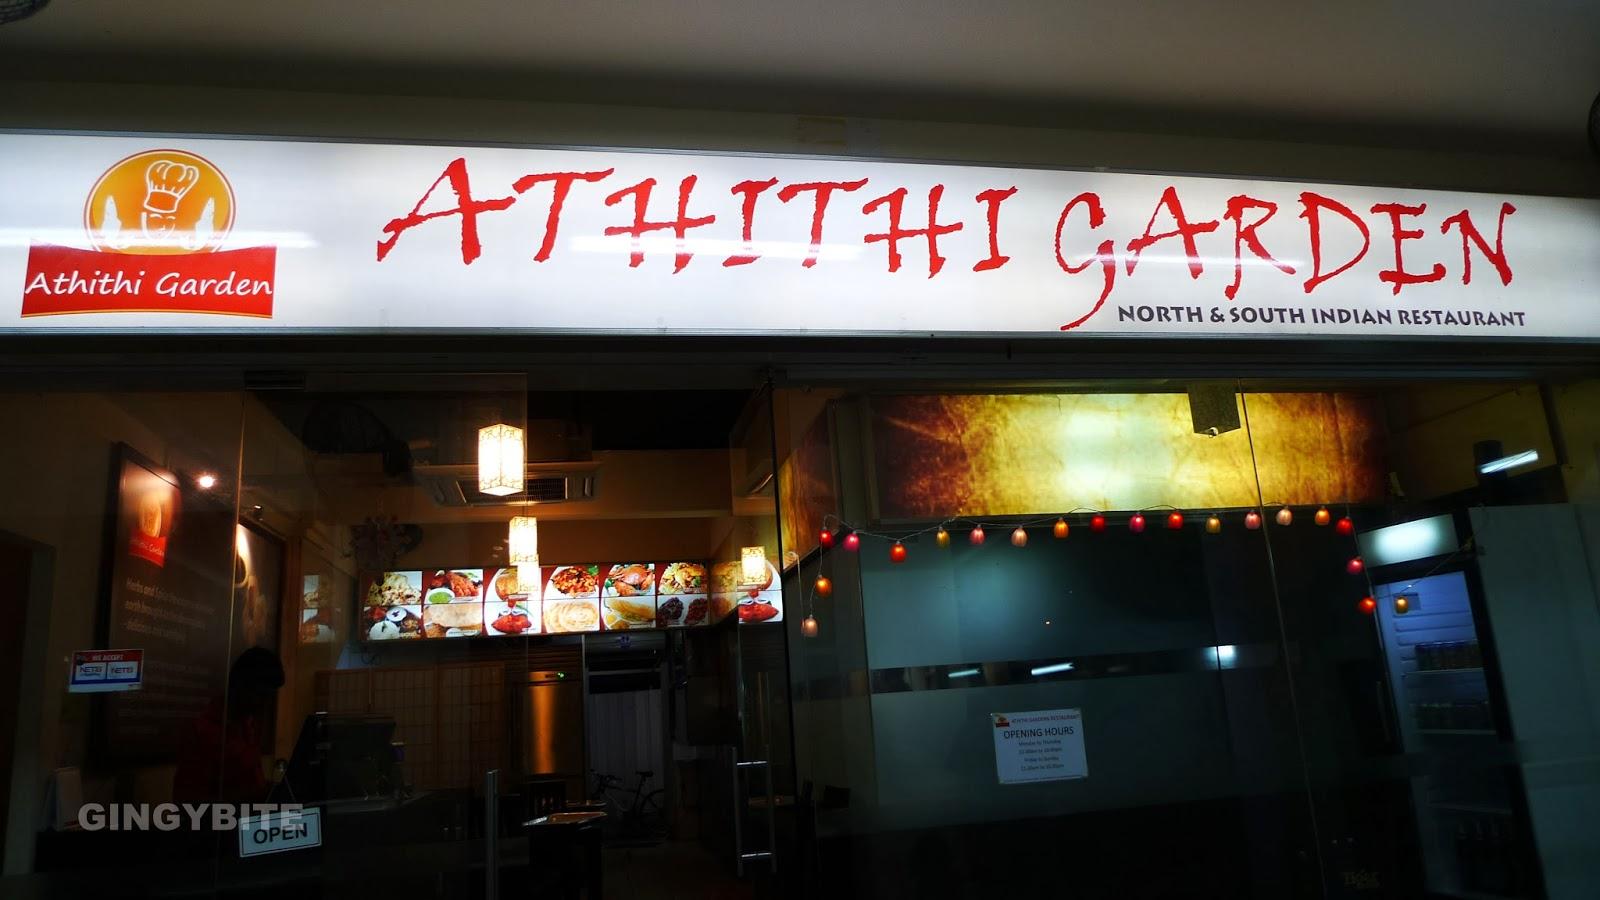 Athithi Garden